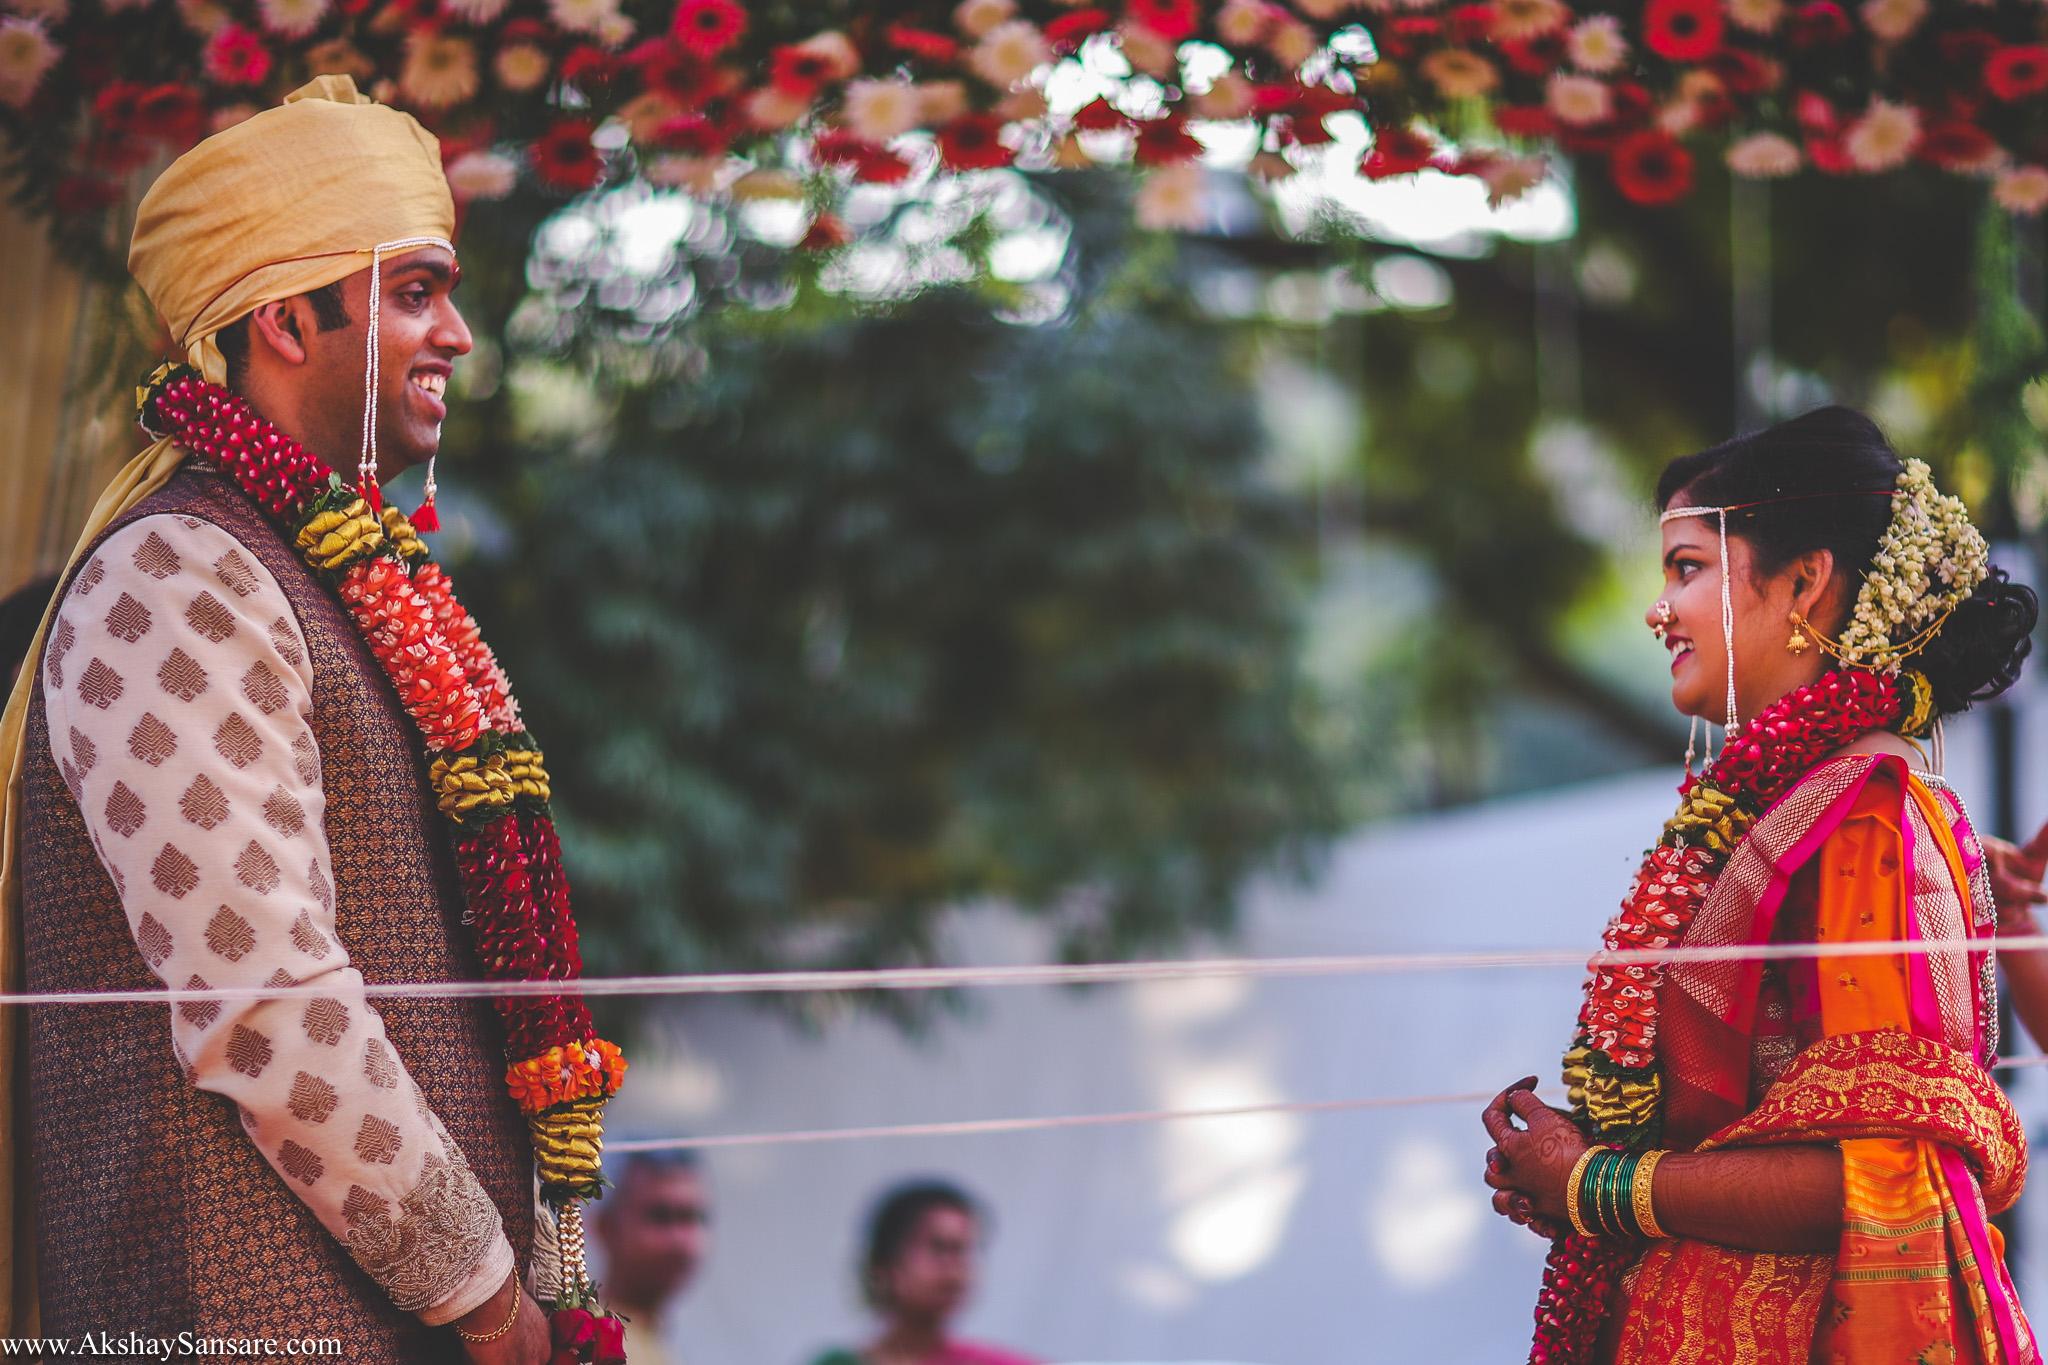 Salil x Kimaya Akshay Sansare Photography Candid wedding Photographer in mumbai best(37).jpg